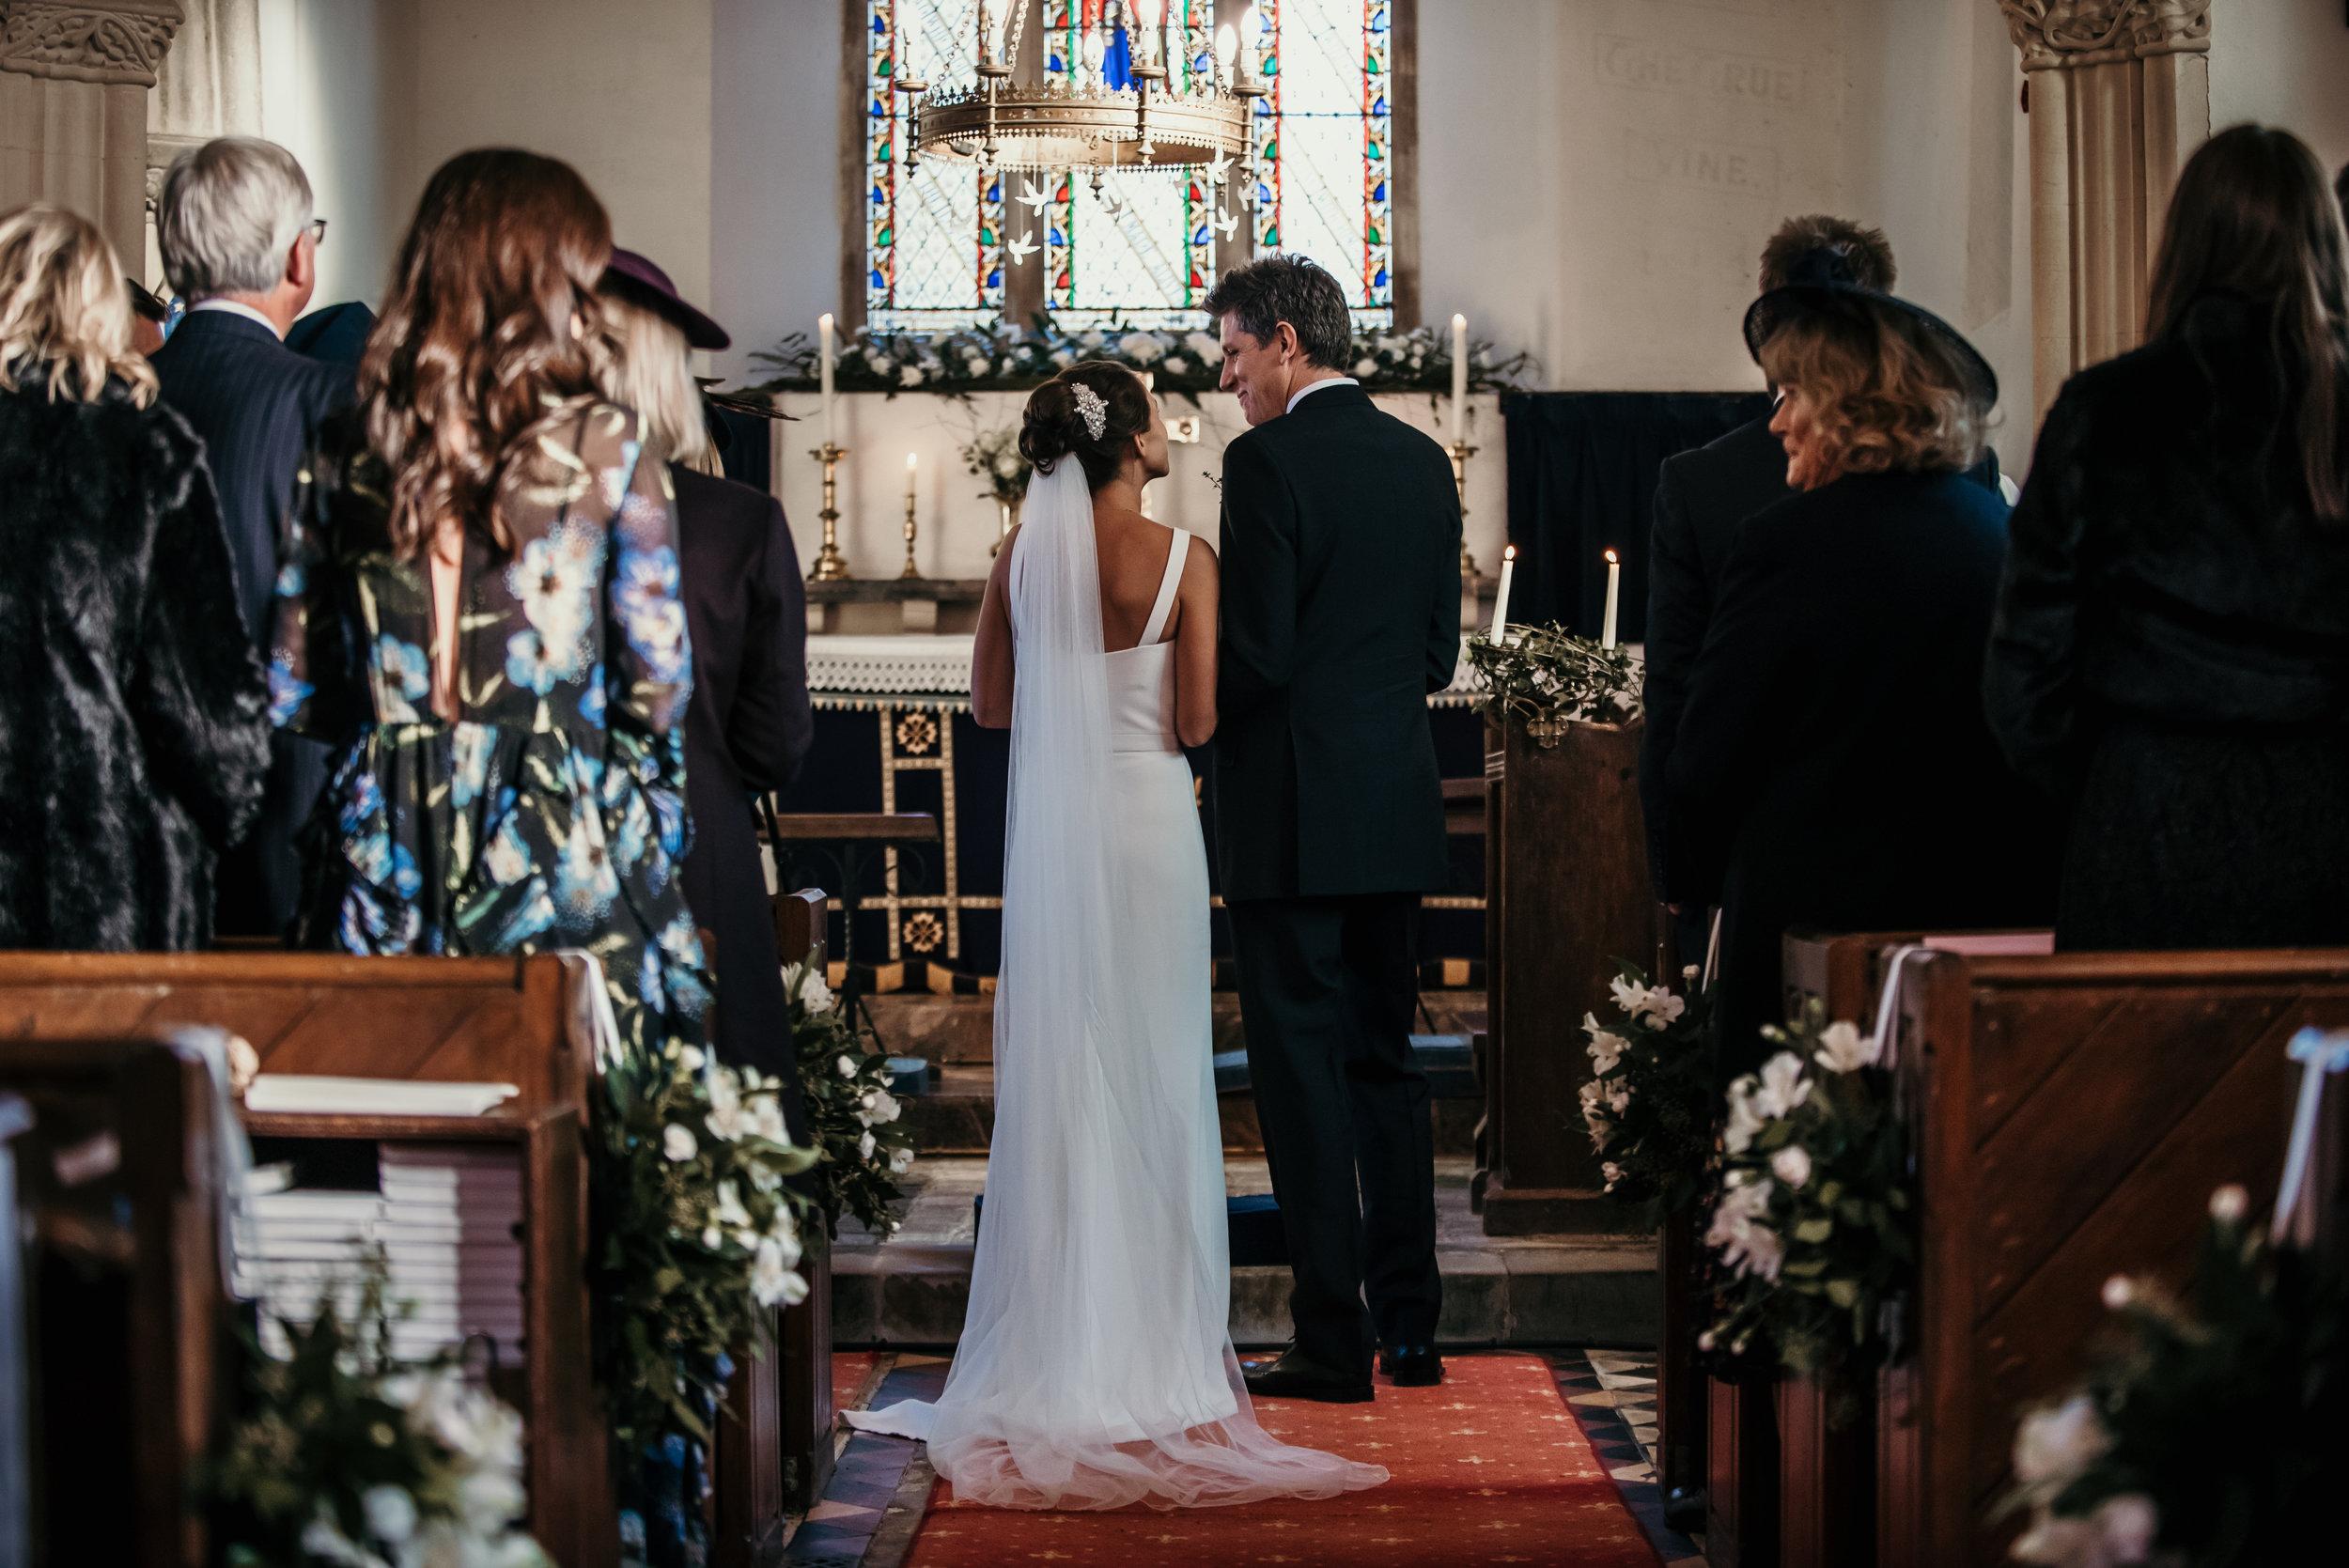 Paschoe-House-Wedding-Photographer-24.jpg